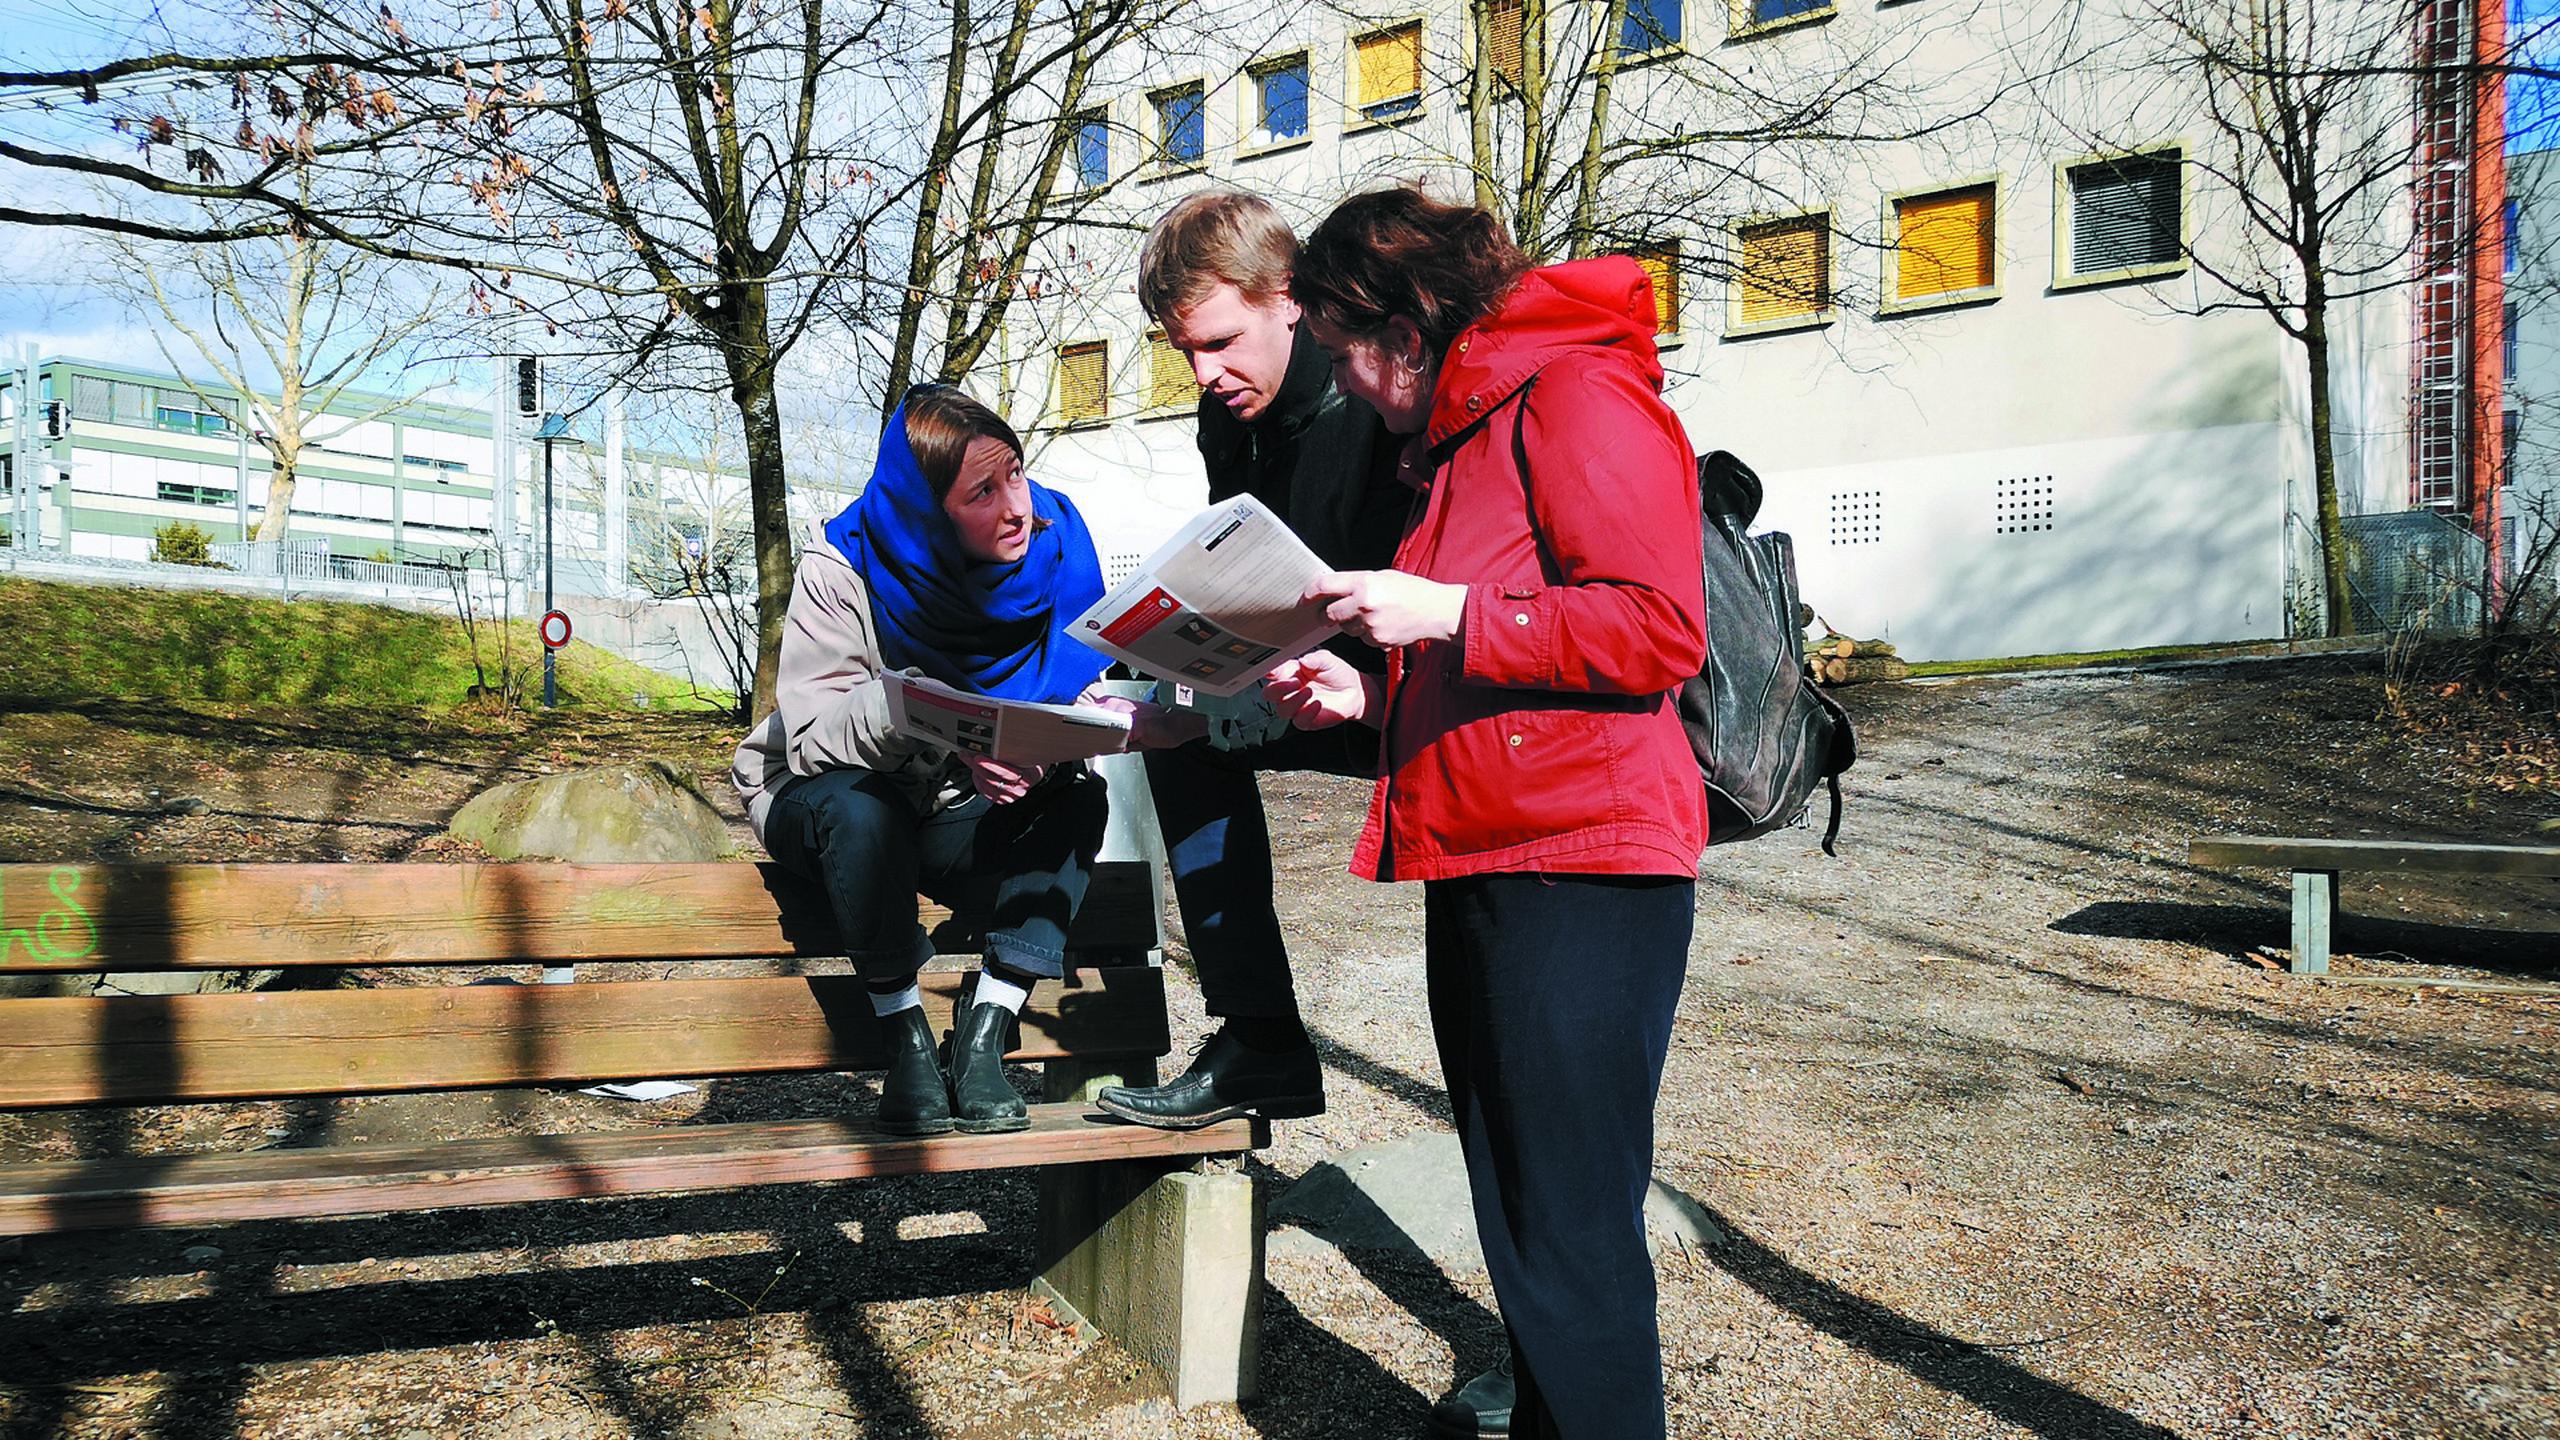 thun-krimi-trail-fruehling-teamwork-fall-loesen